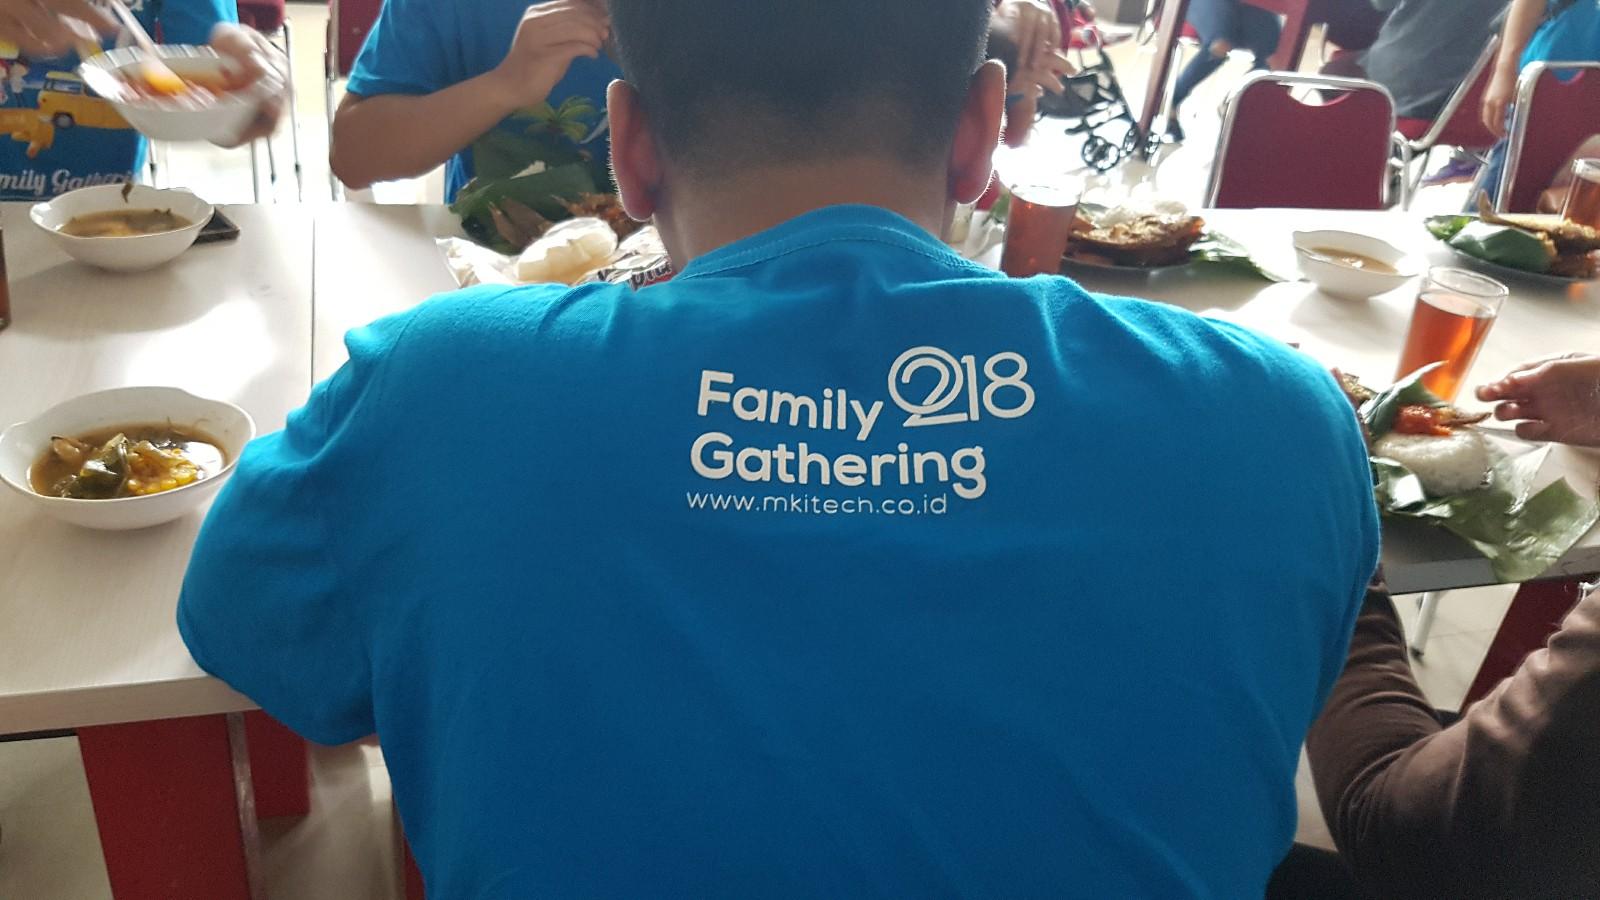 Family Gathering (2018)